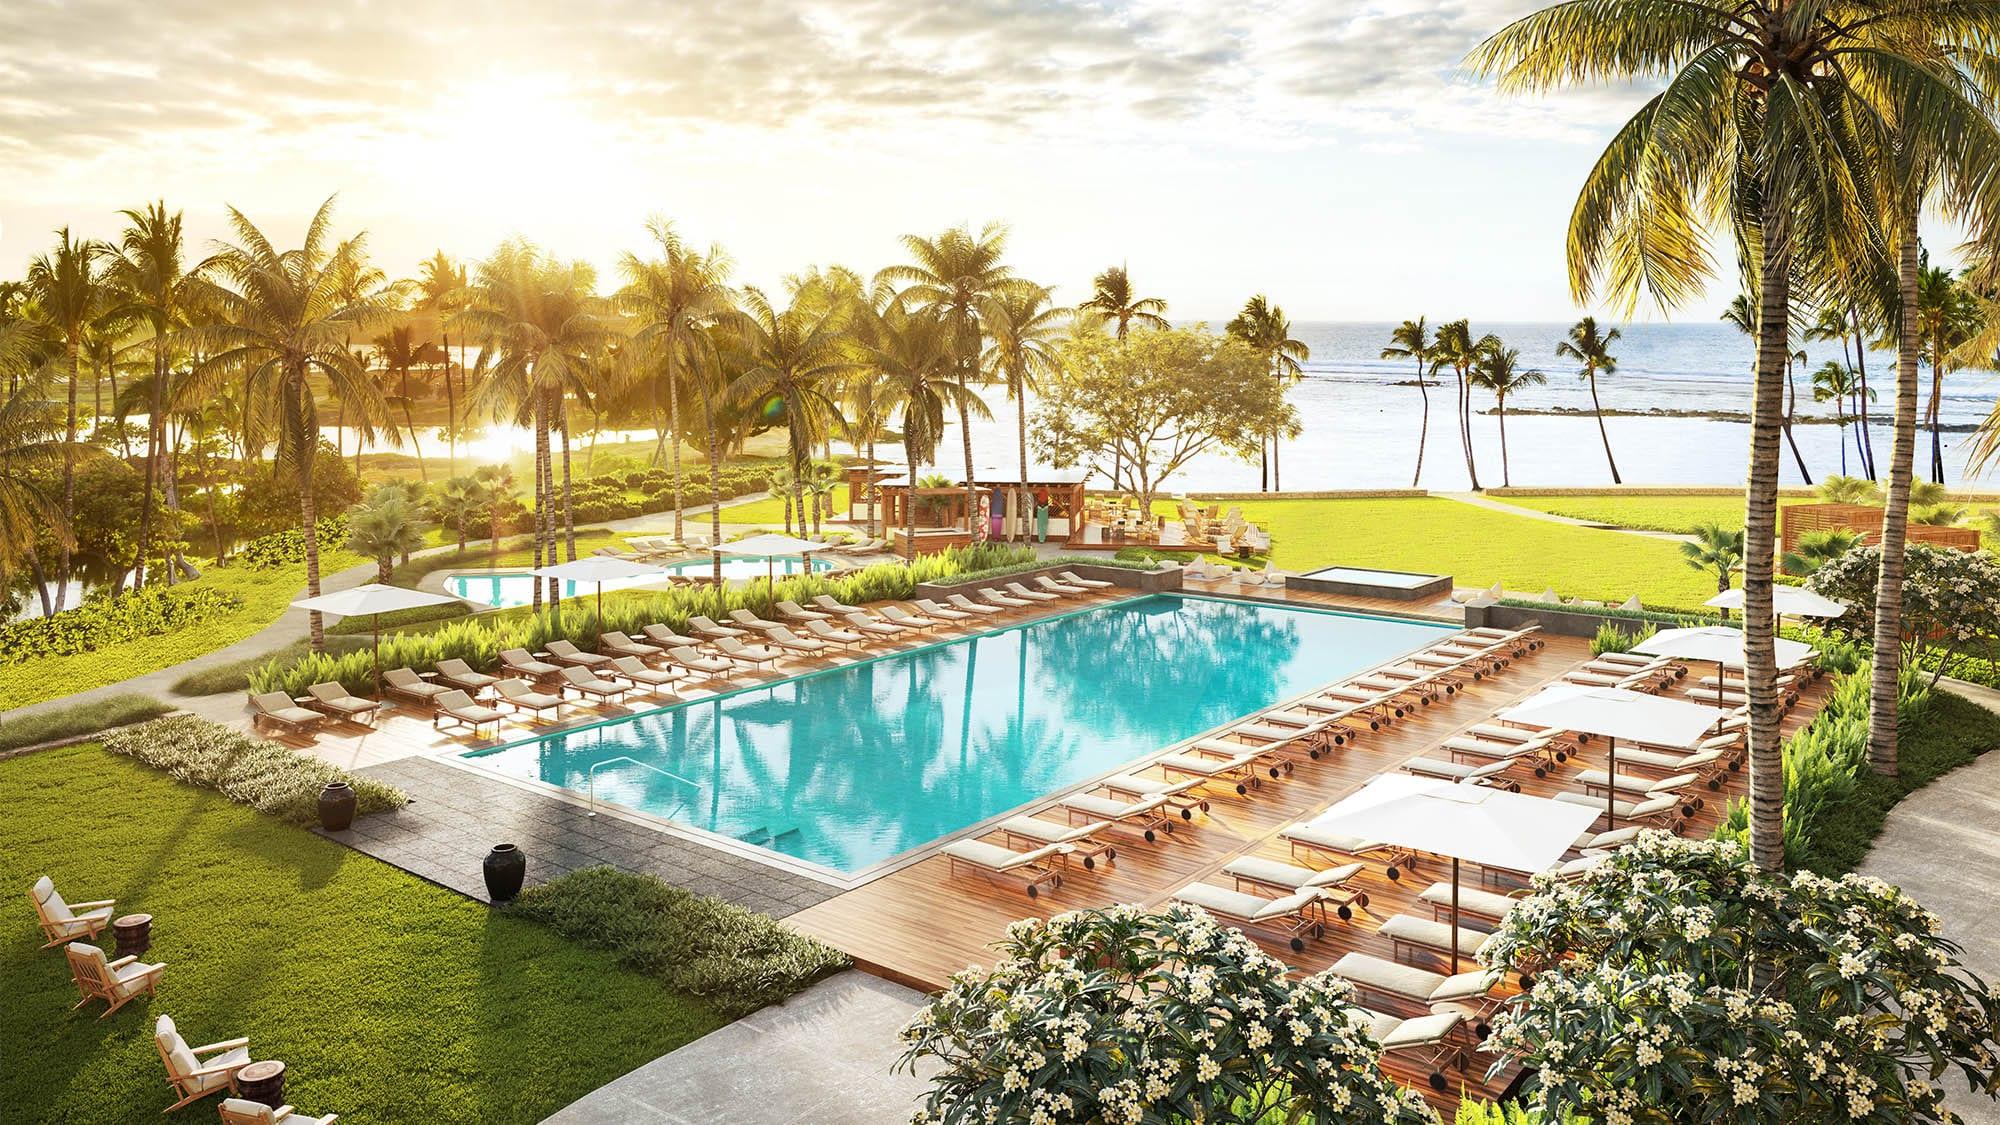 MaunaLani-resort-pool.jpg